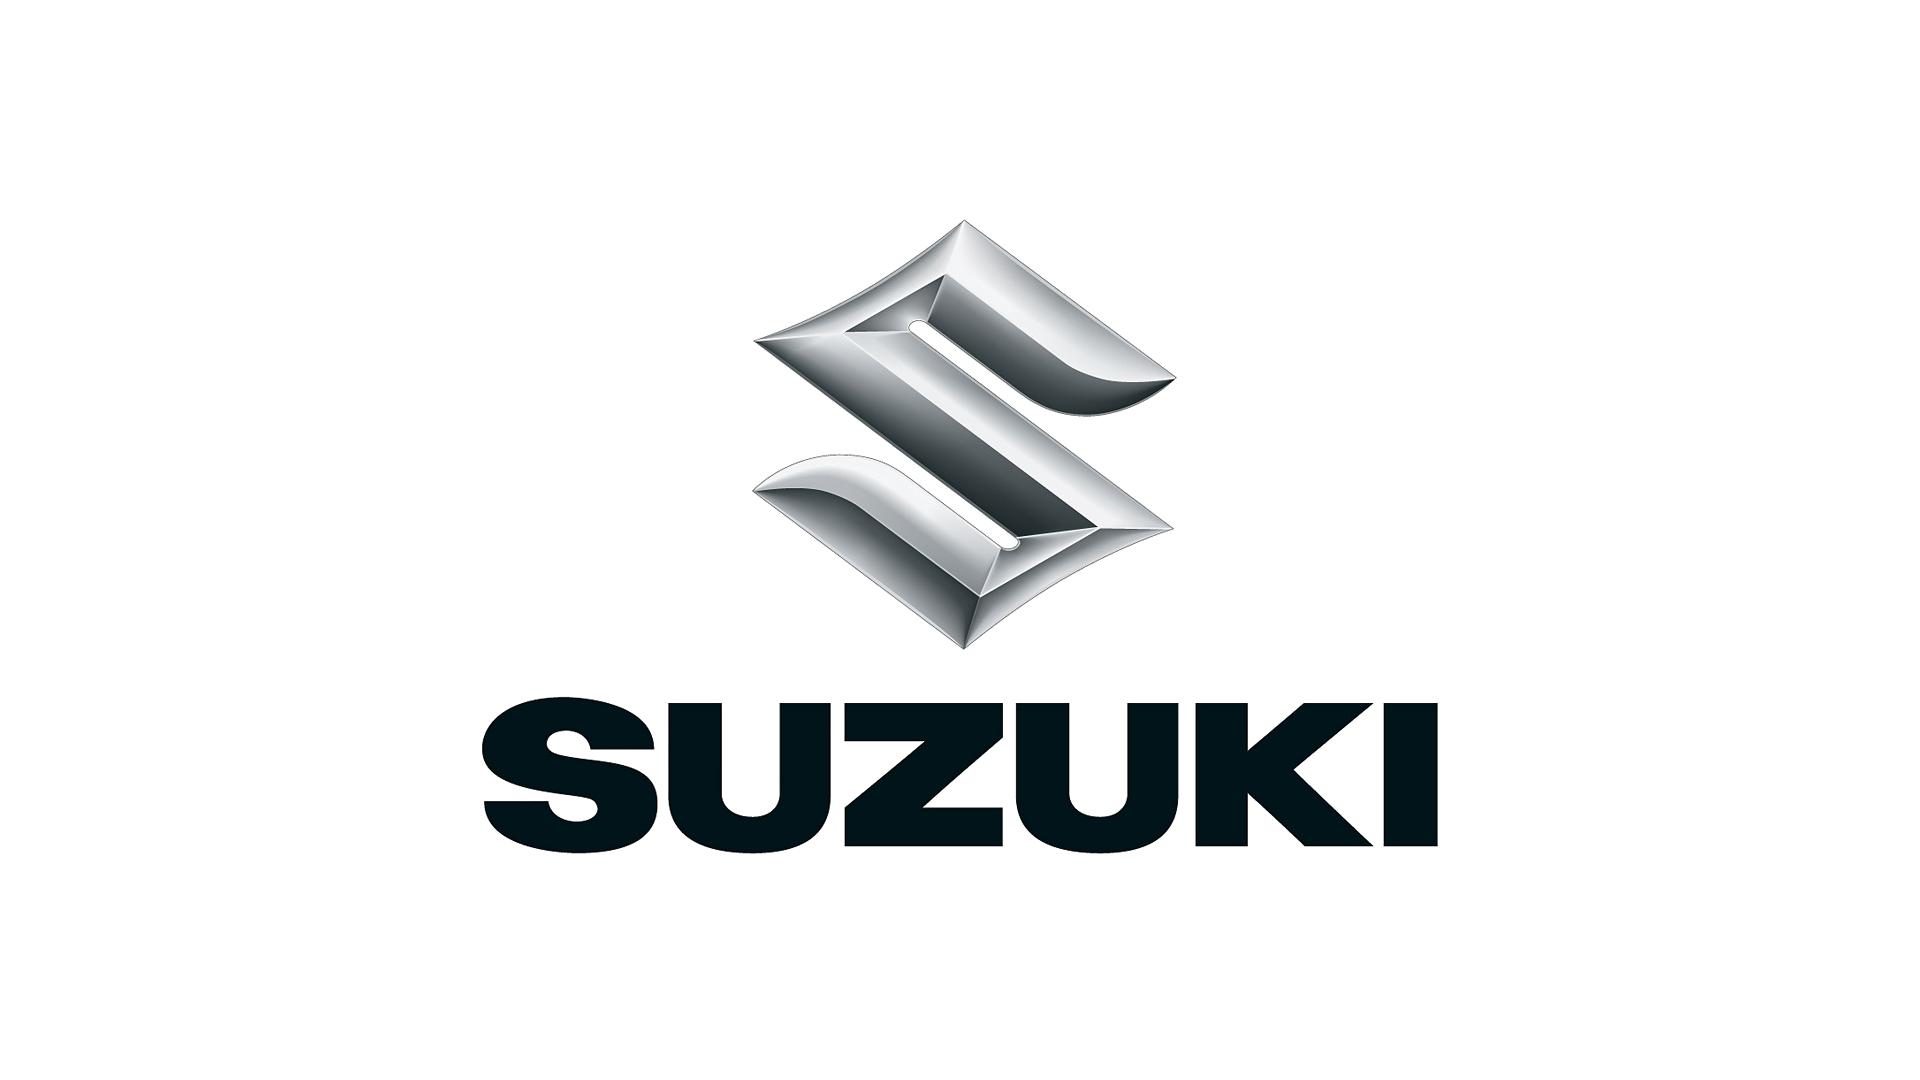 Suzuki-refaire-cle-serrurier-automobile-